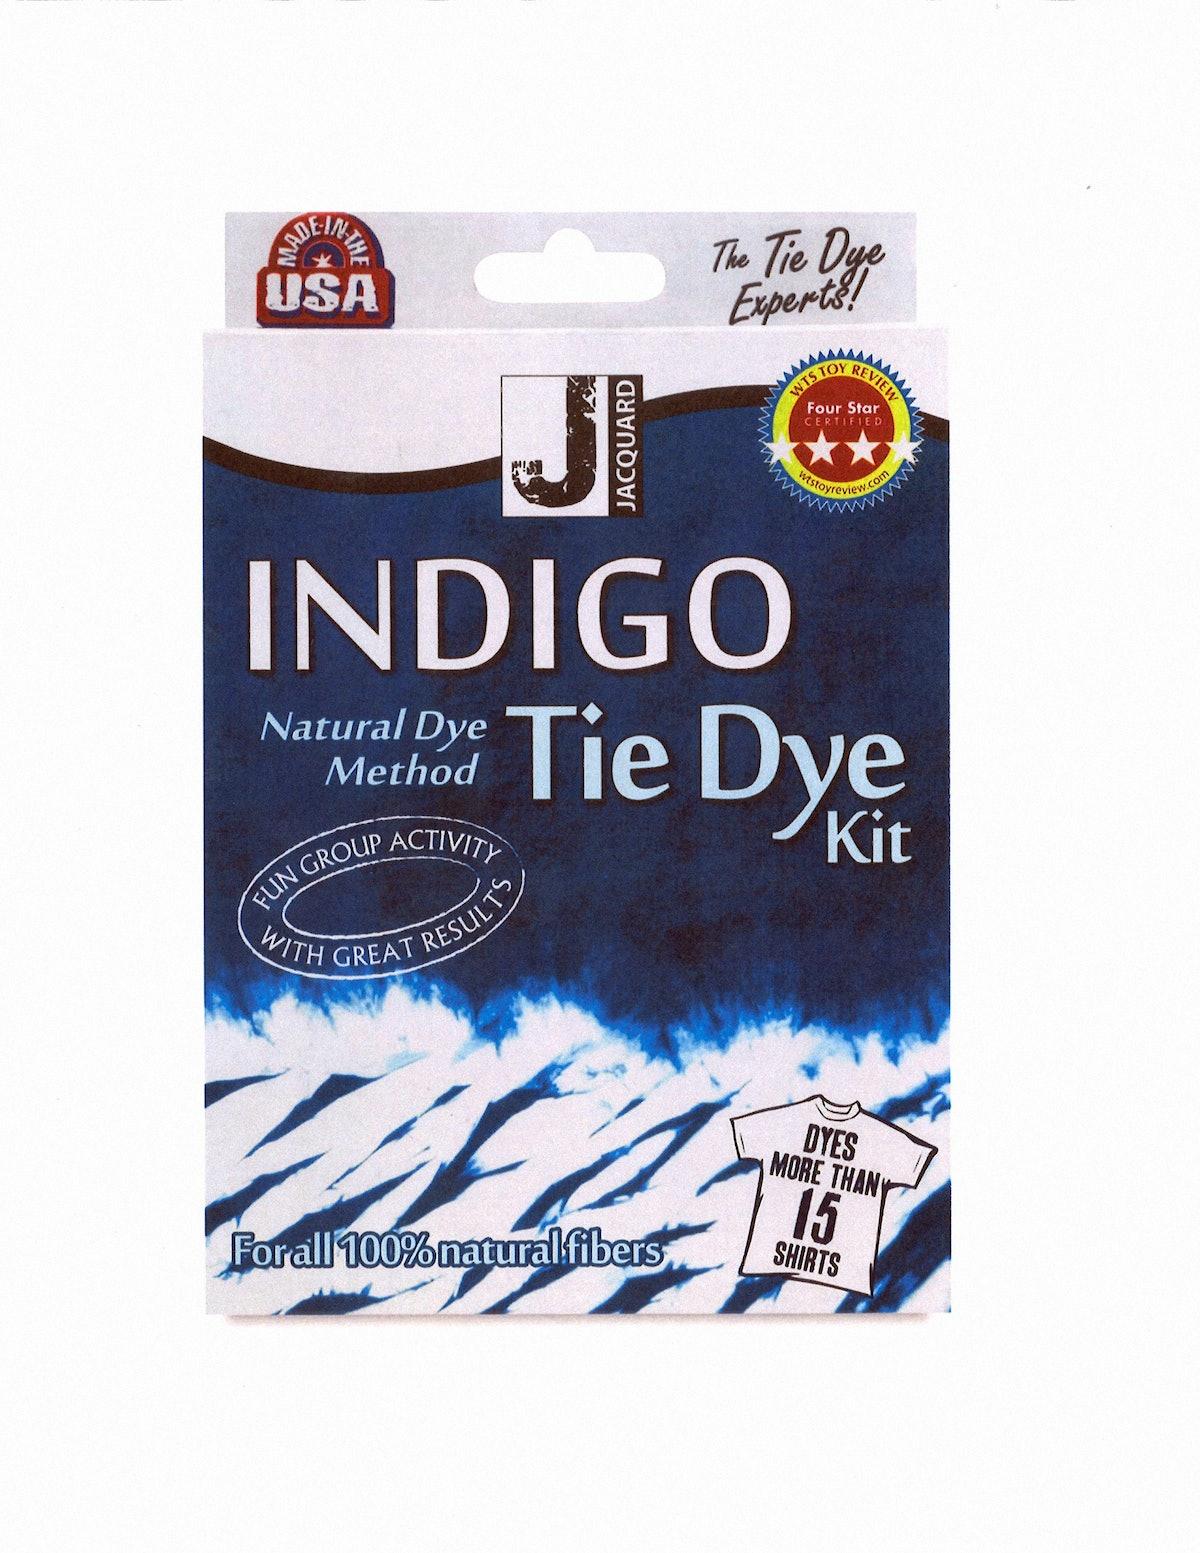 21_Indigo Dye Kit.JPG